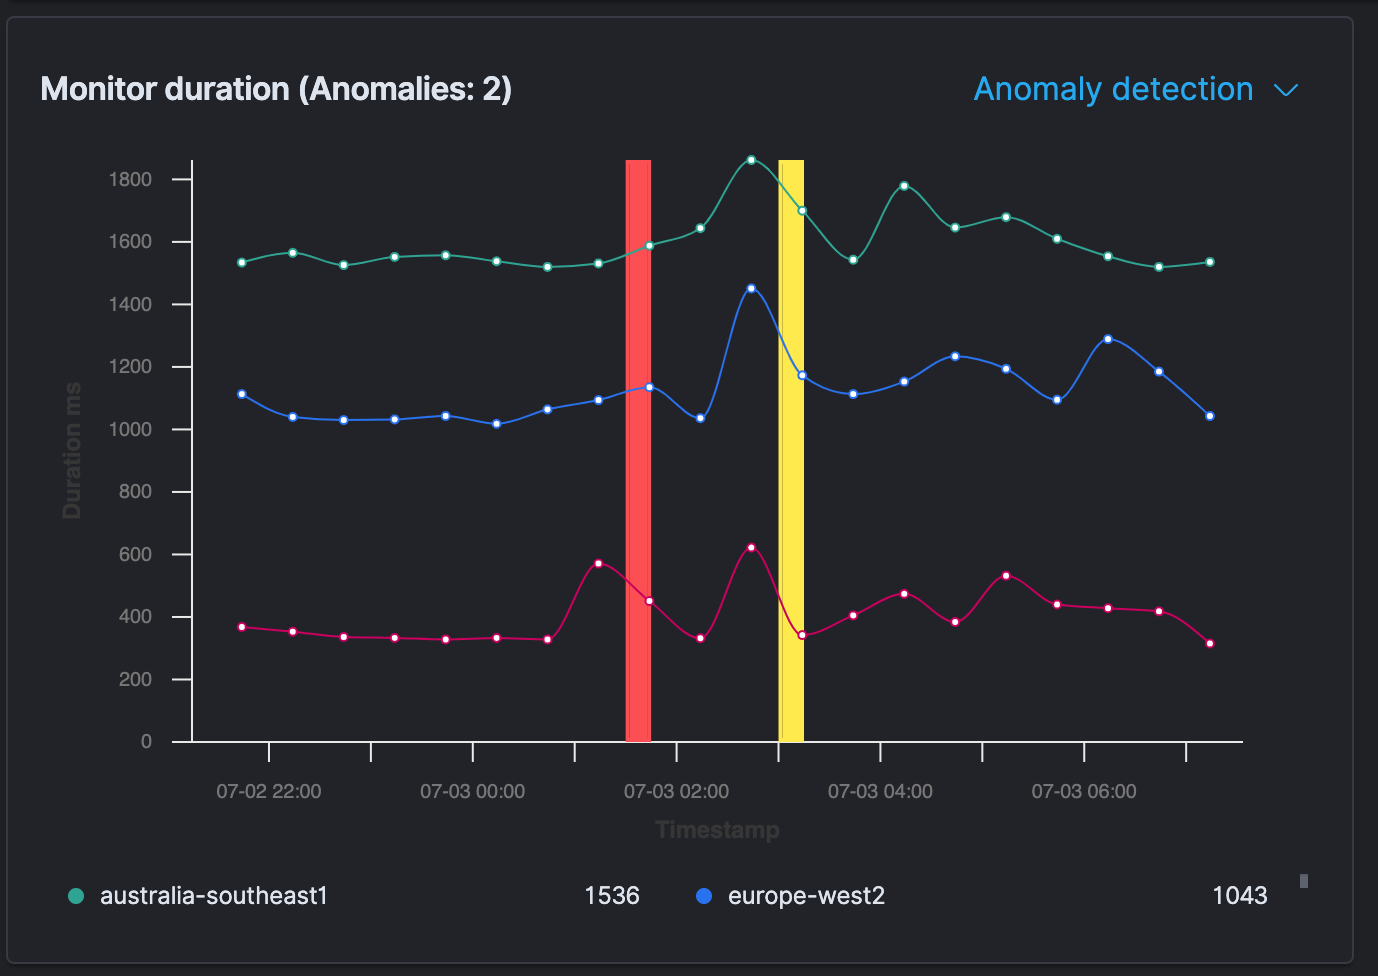 Monitor duration chart